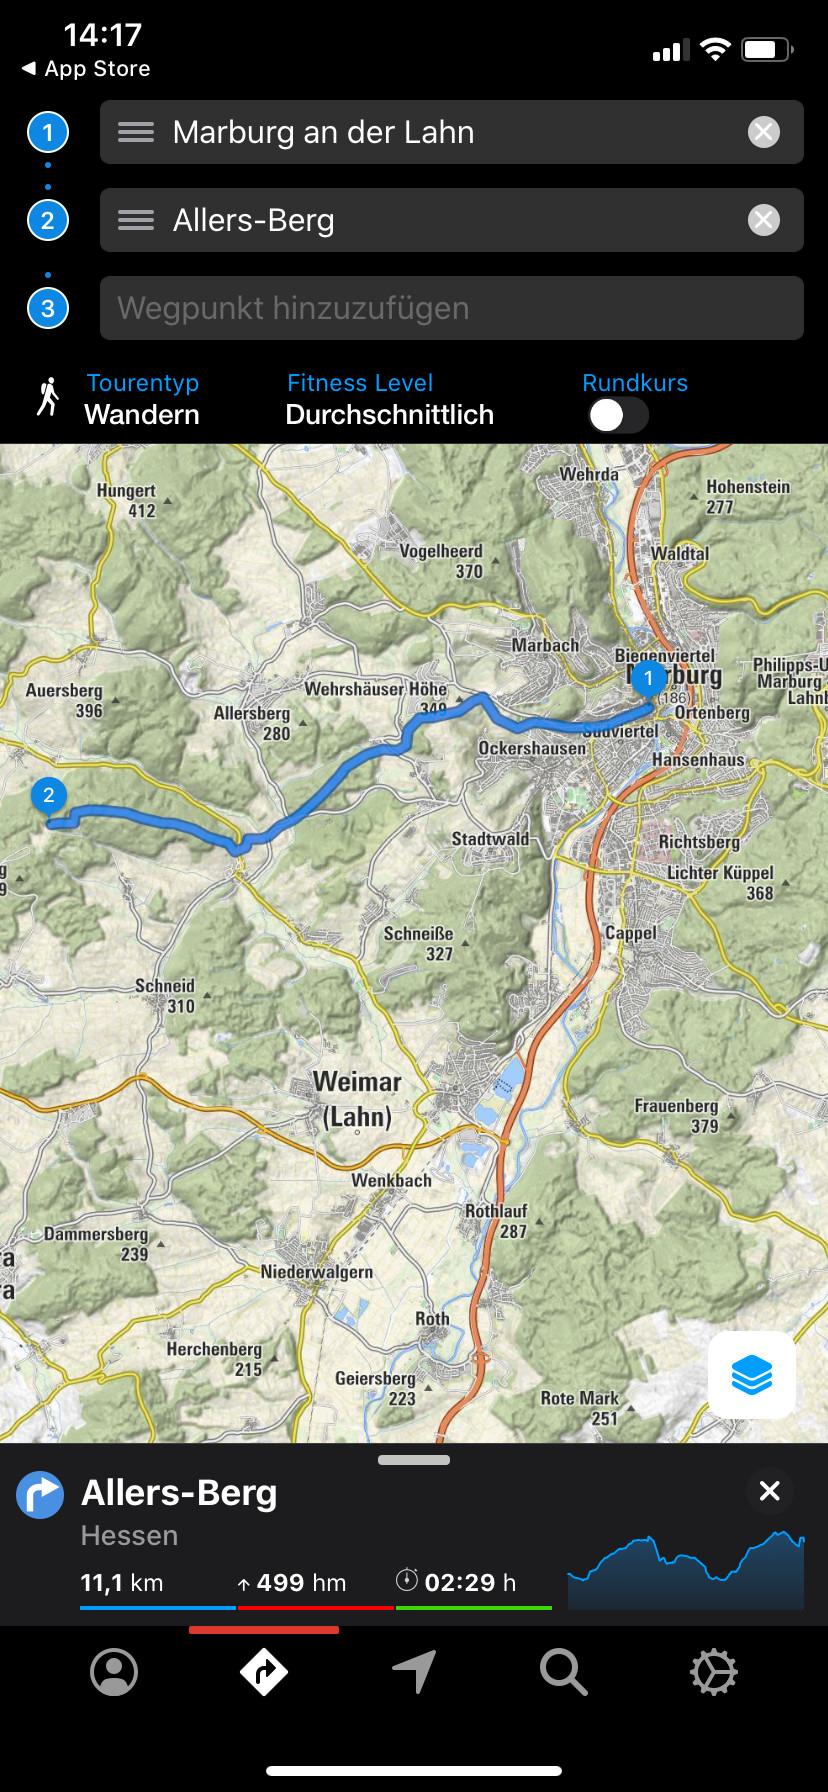 Screenshot 1 - Bergfex Touren & GPS-Tracking: Navi zum Wandern, Radfahren & Laufen (App für iPhone & iPad)